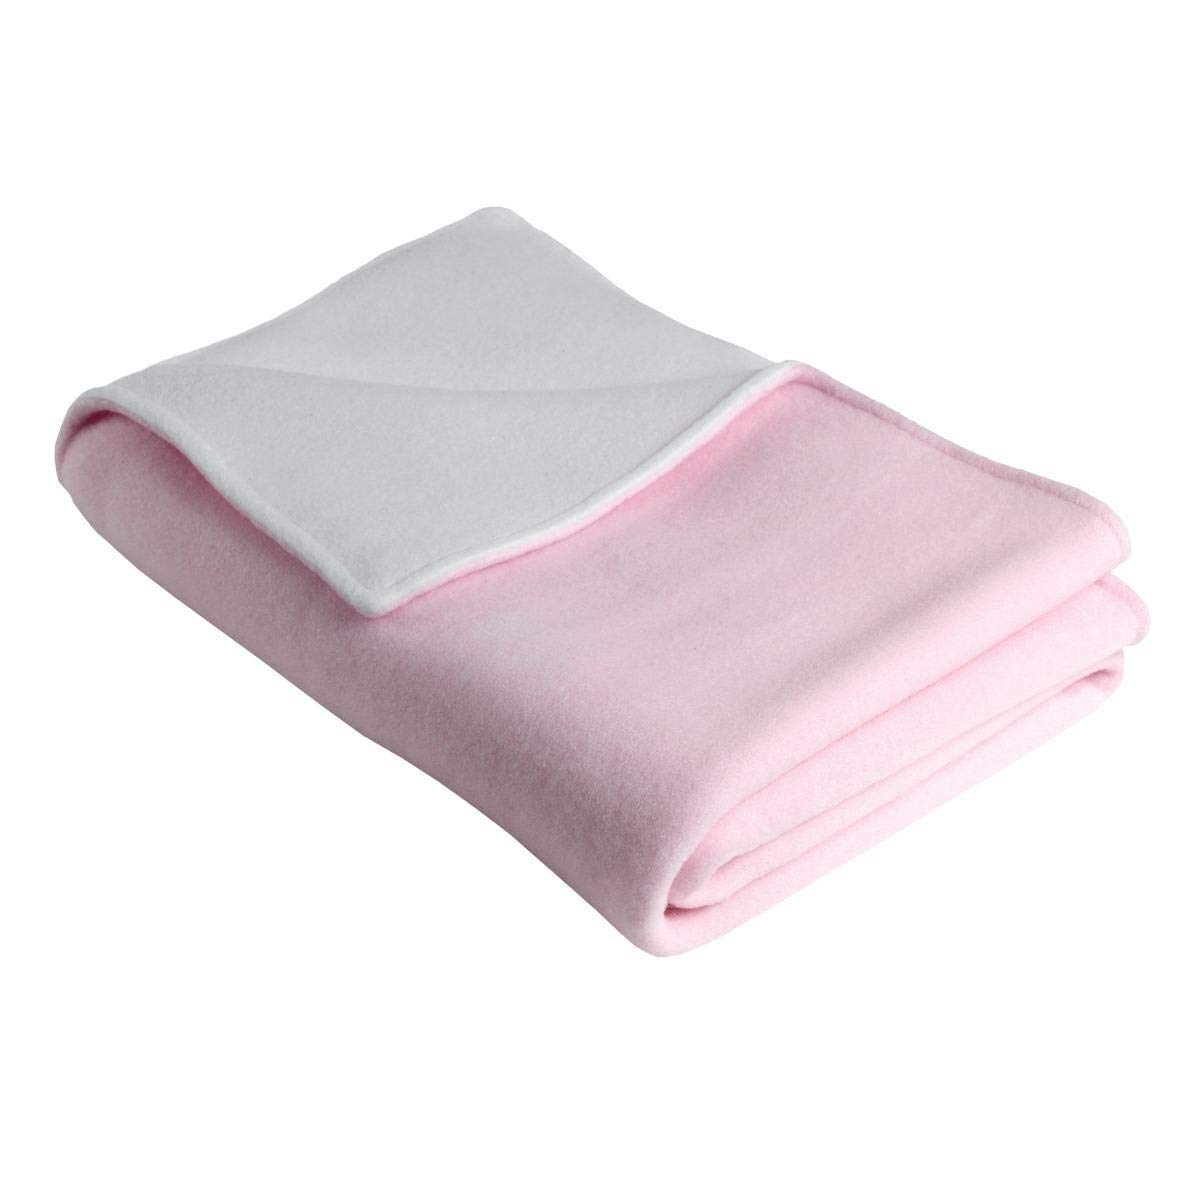 Original Turtle Fur Fleece - Baby Pink Light Blanket Dedication W High material Security